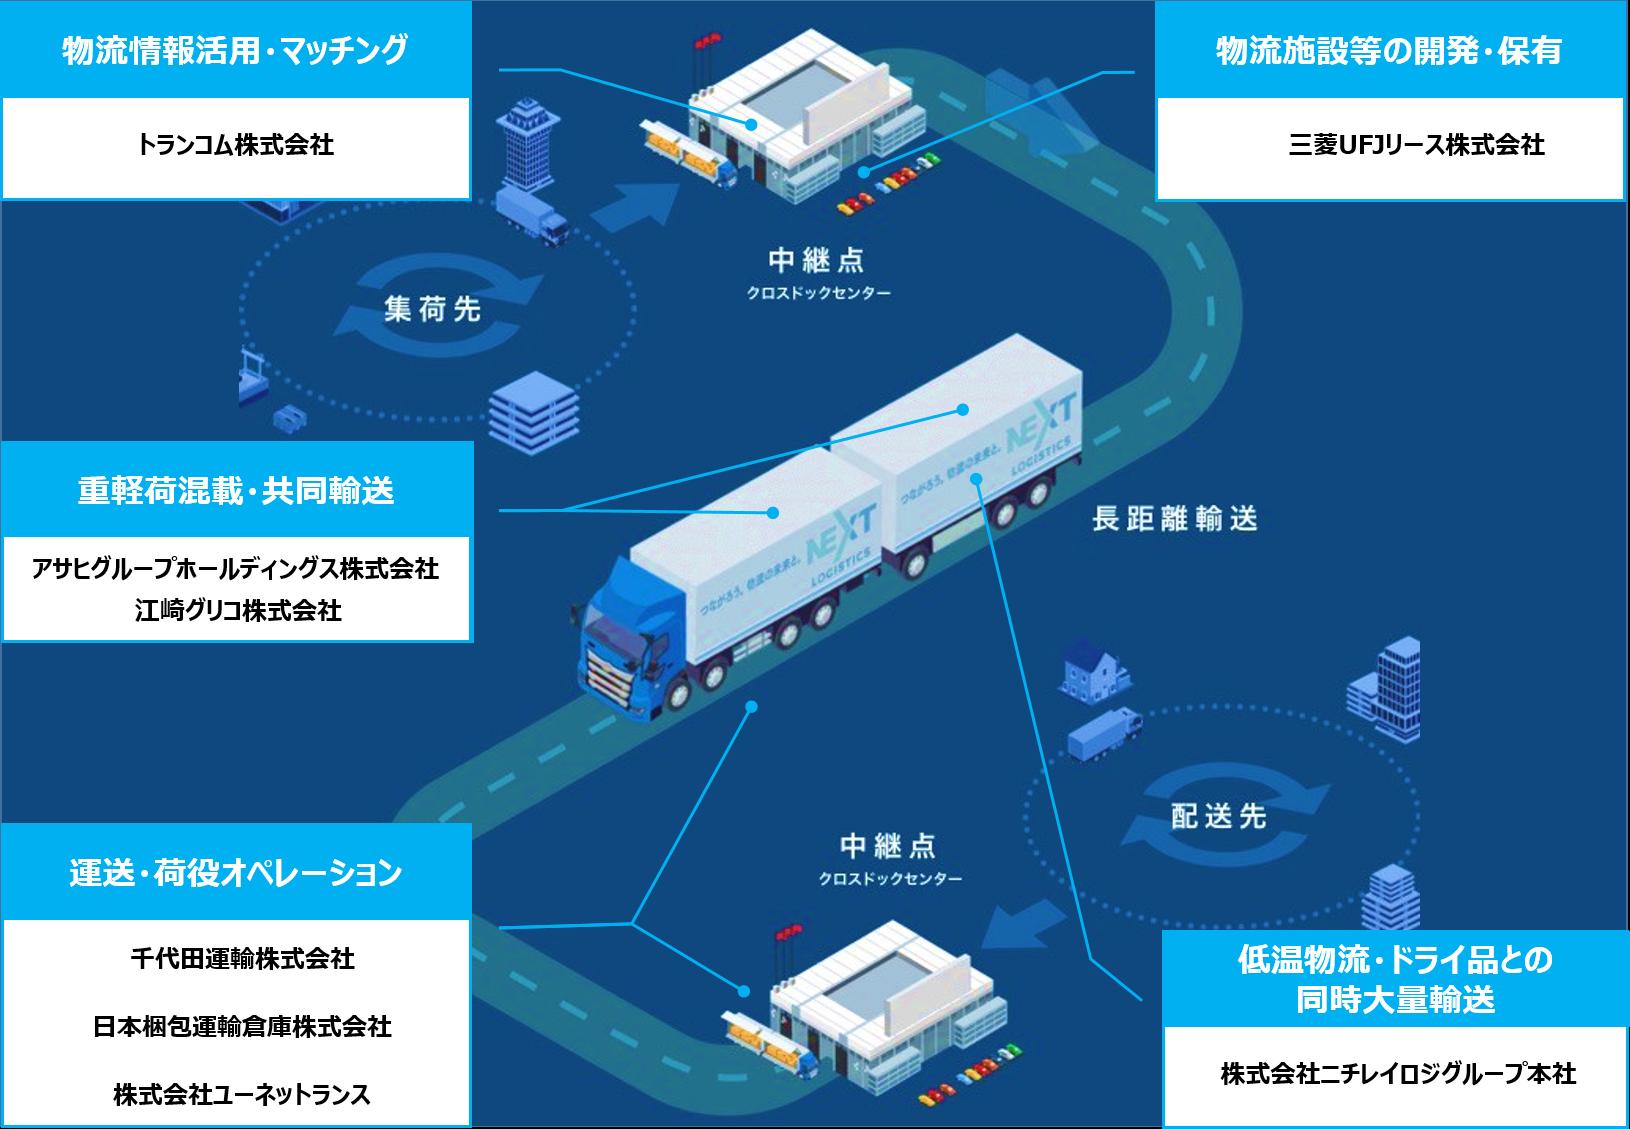 NLJ物流環境負荷軽減技術開発賞.png